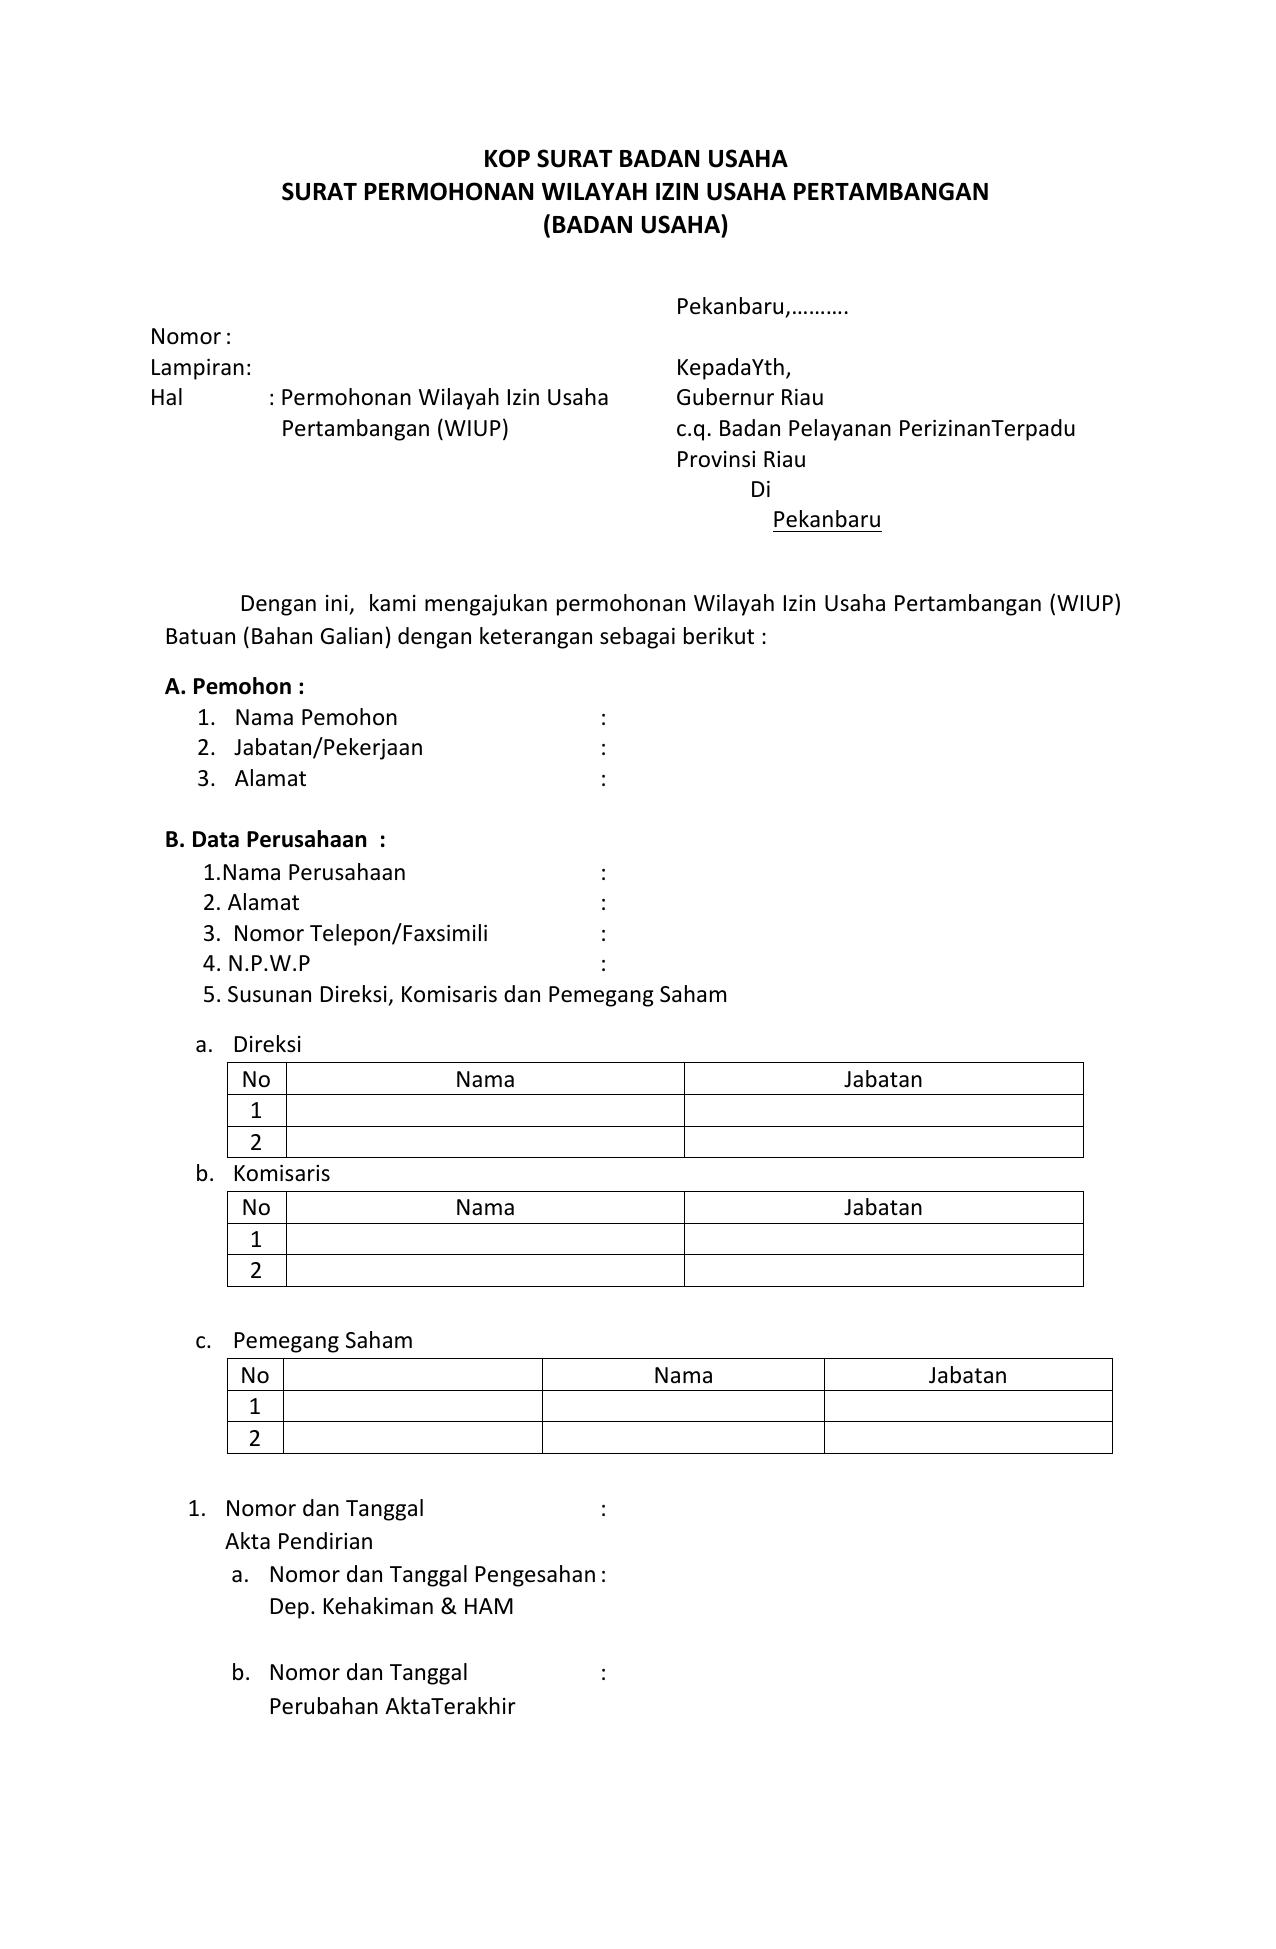 Surat Permohonan Wilayah Izin Usaha Pertambangan Perseorangan